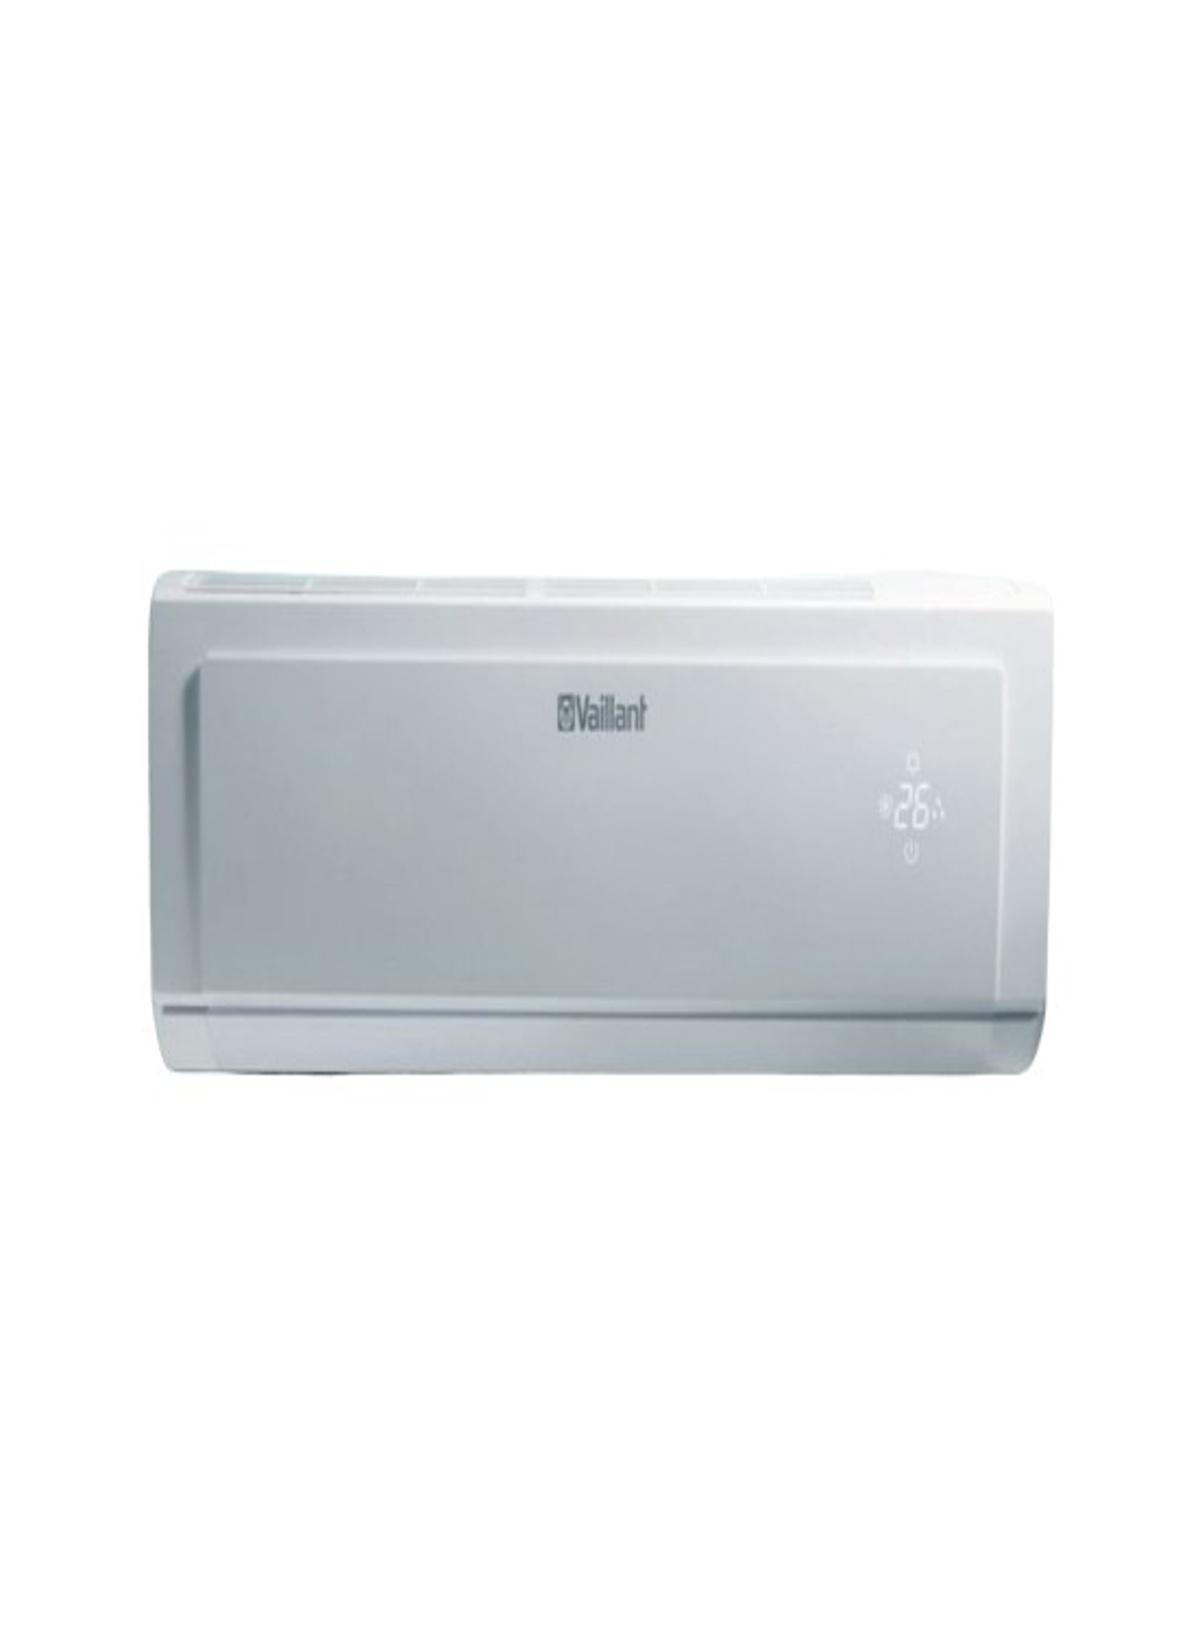 Standart Vaillant VAI8-035WN Inverter Split Klima 11.945 Btu h